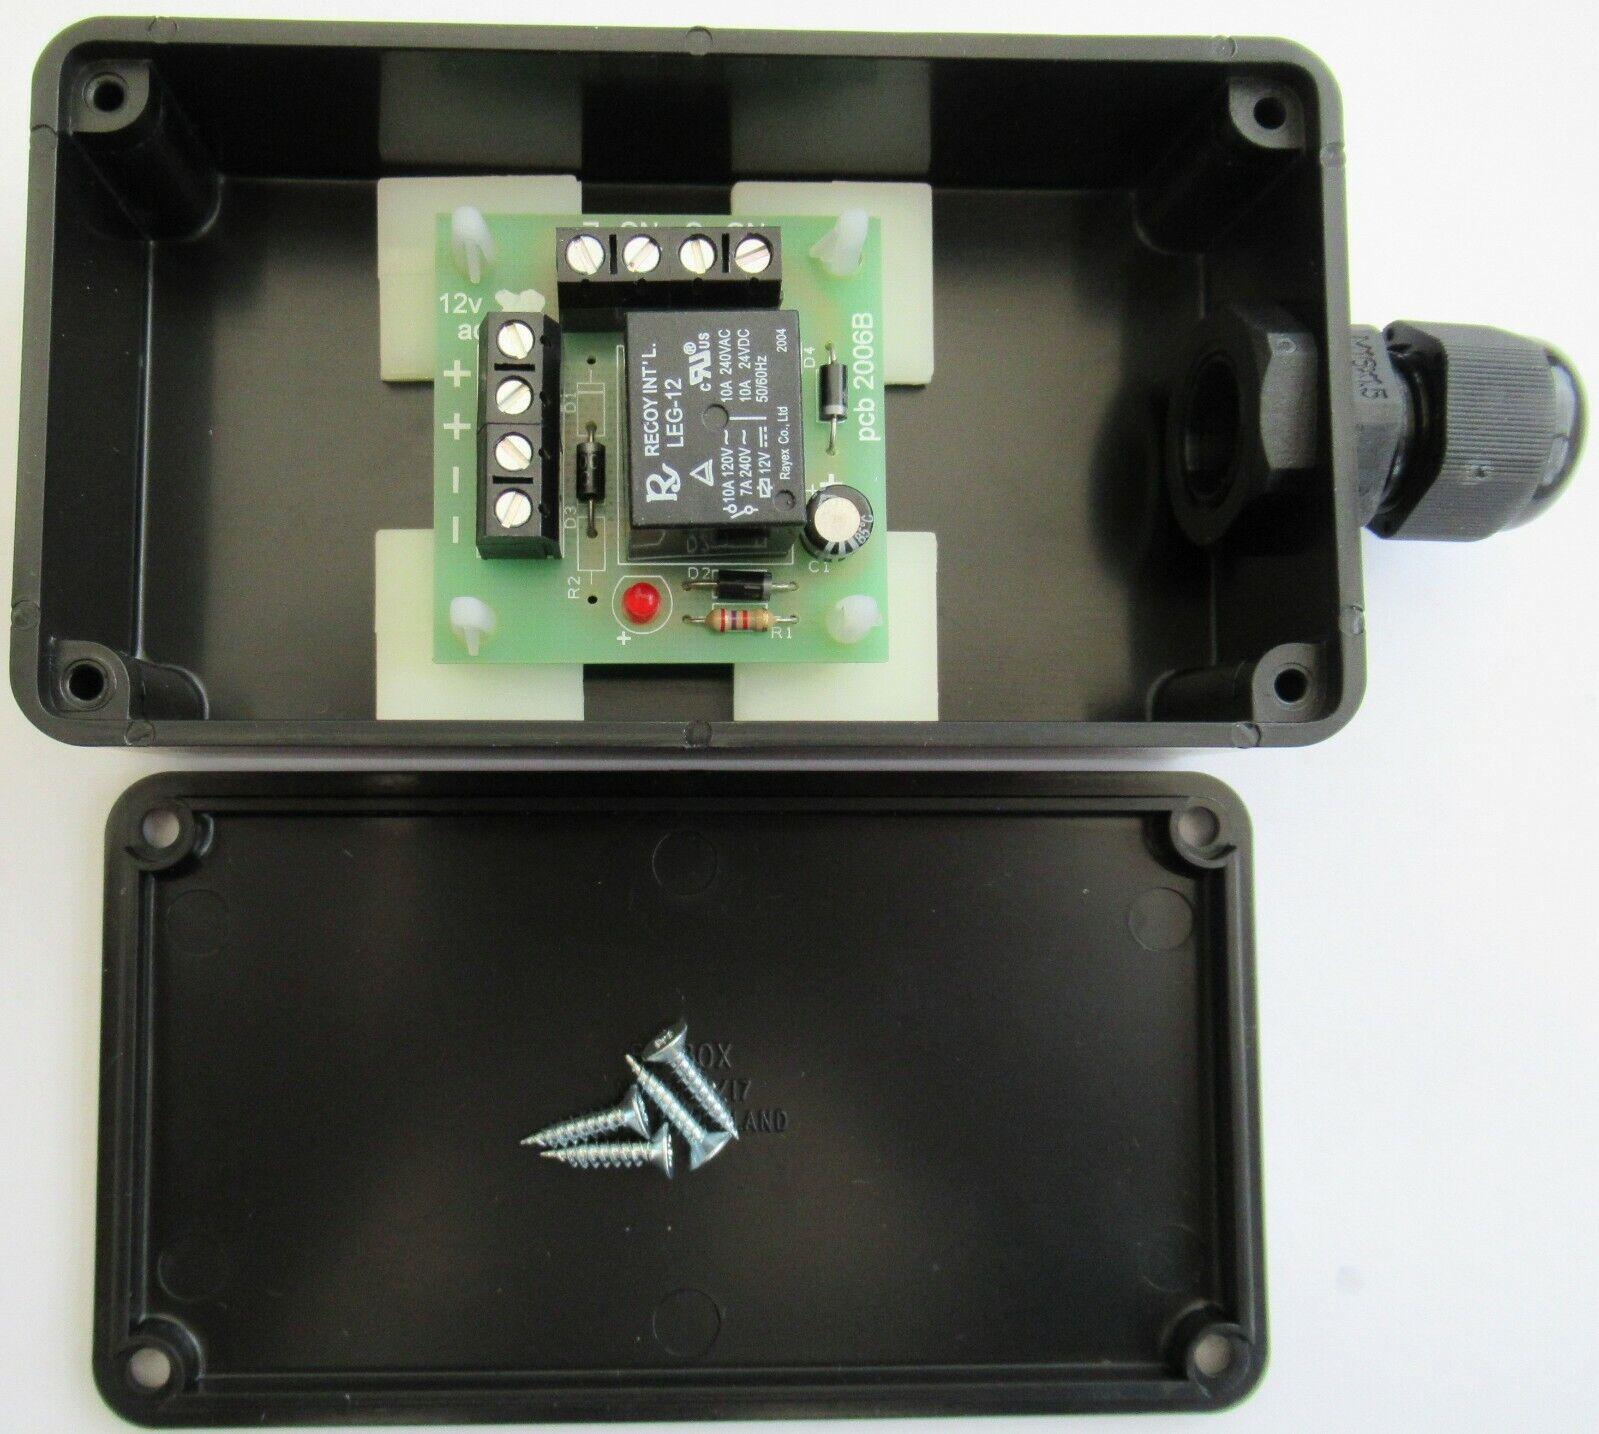 12v ac/dc Mini Handy little Relay board in a black box c/w cable gland